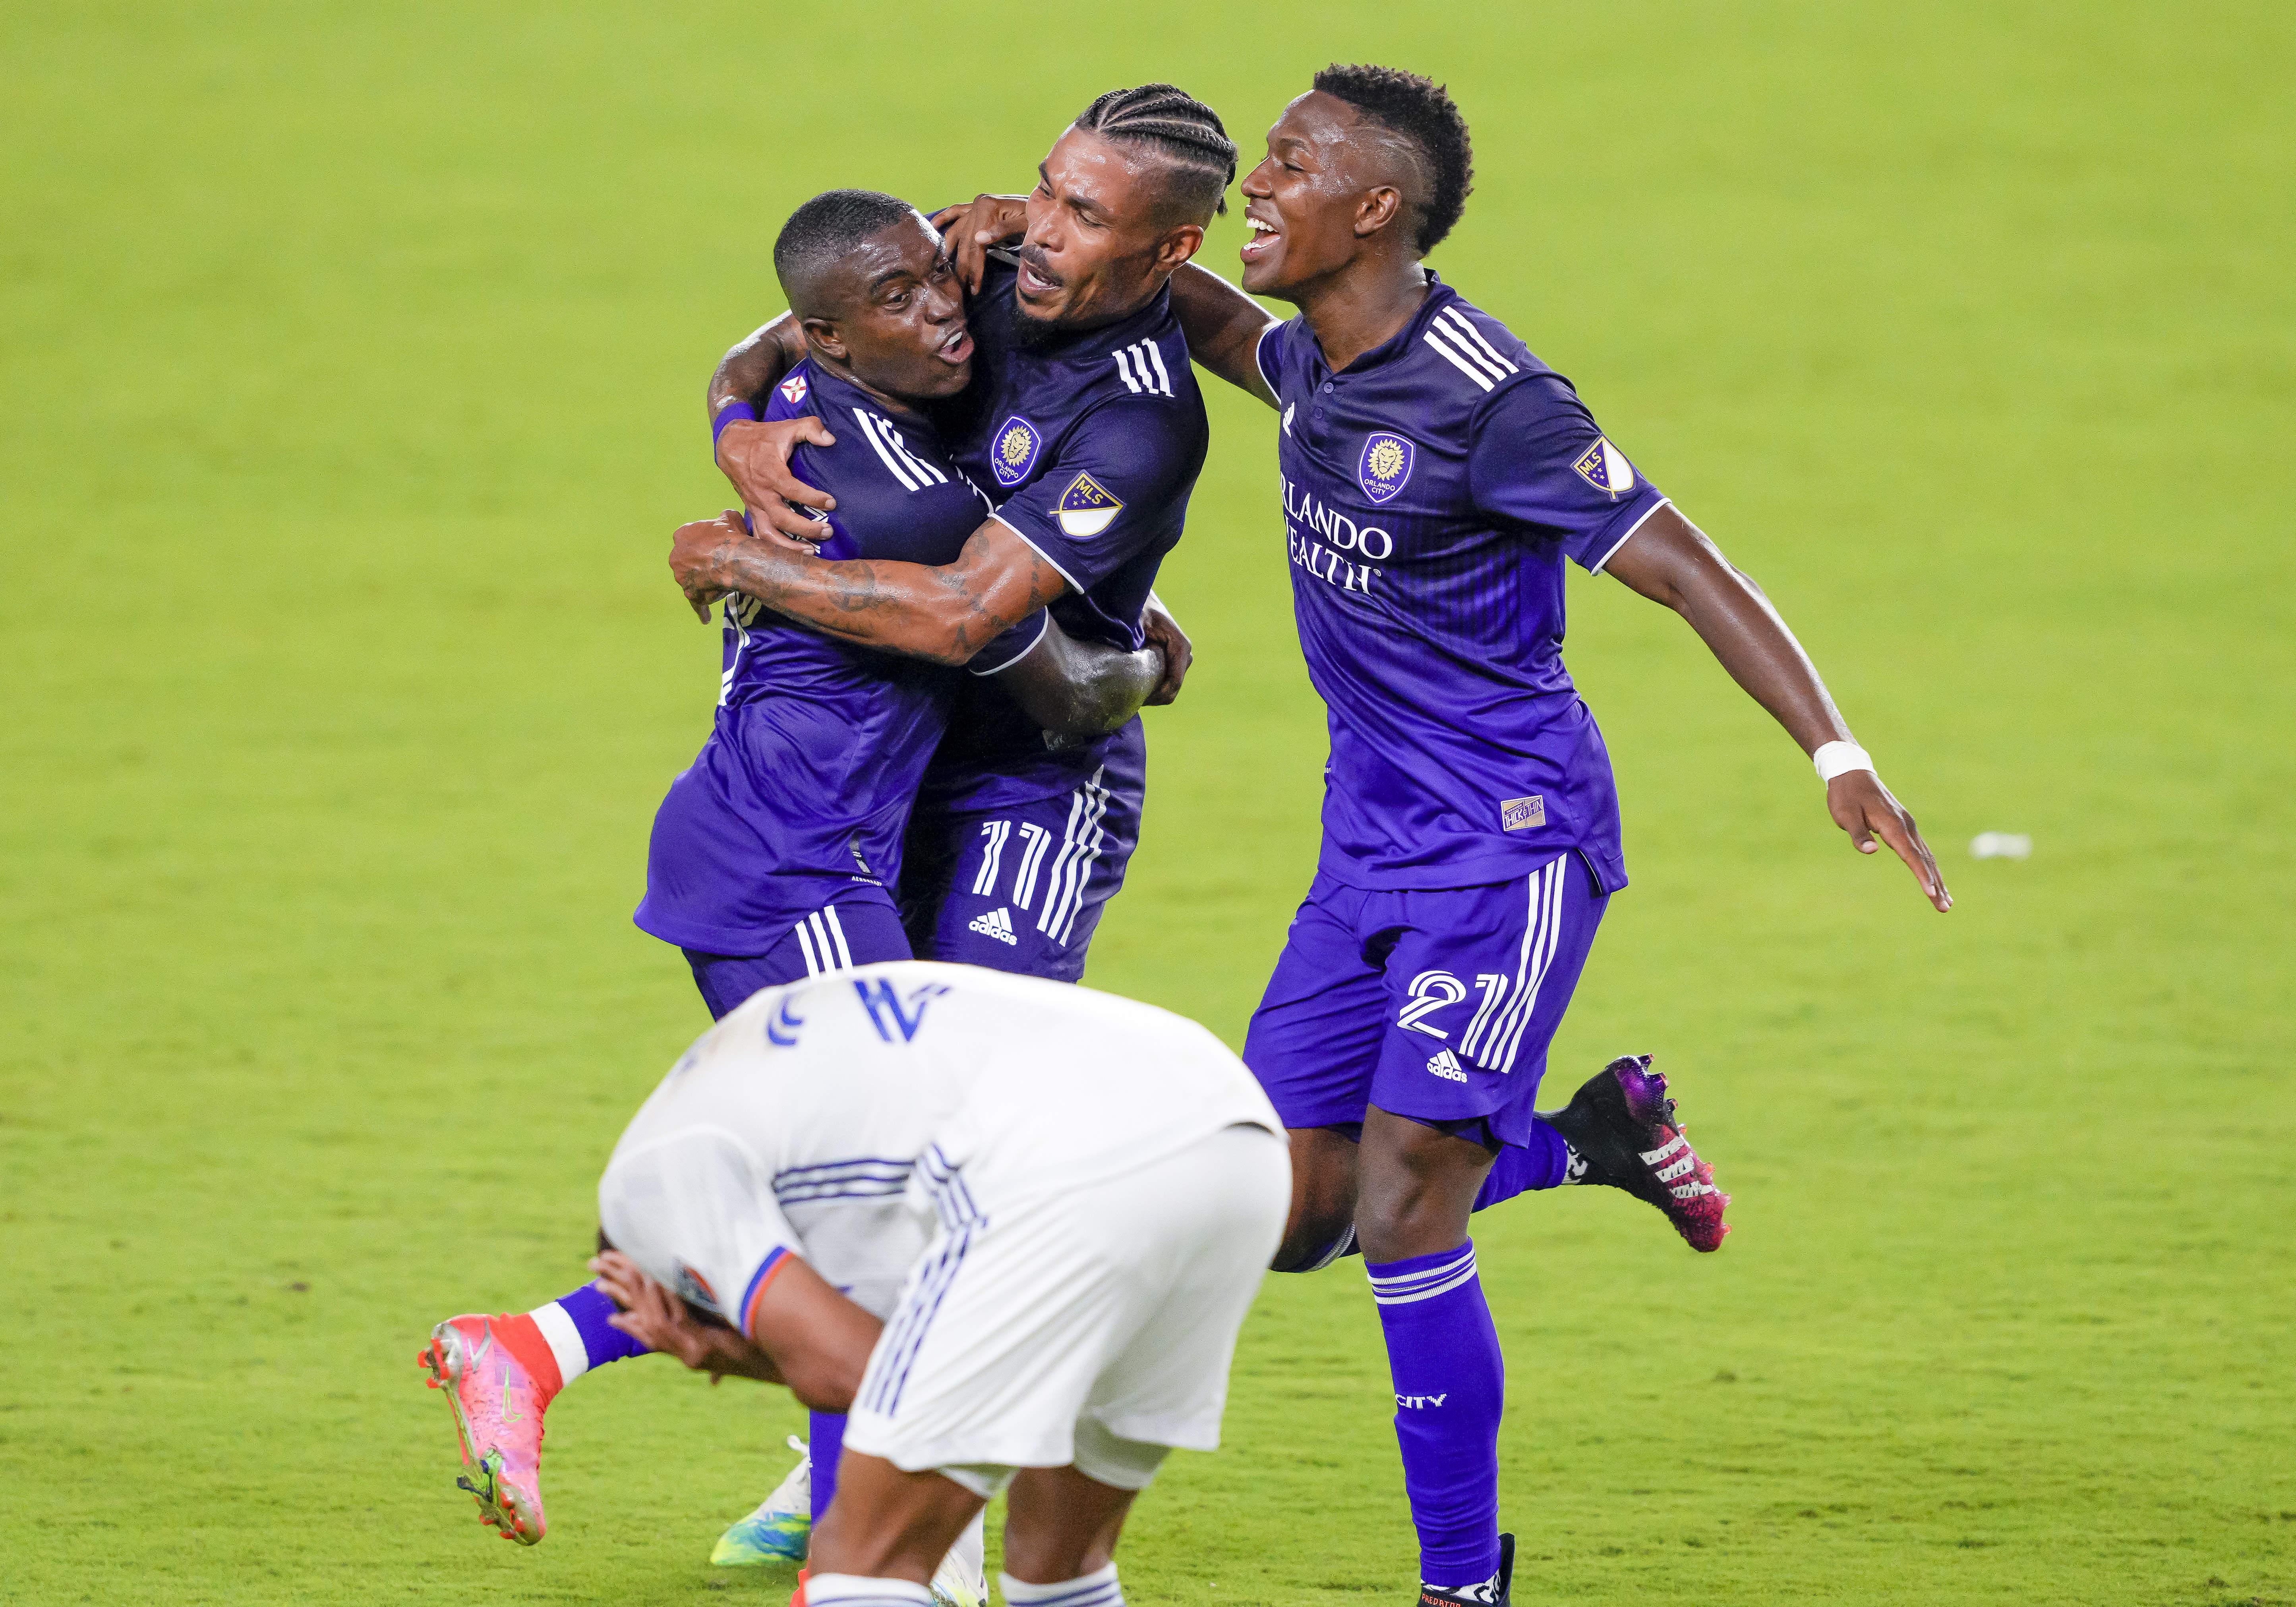 SOCCER: MAY 01 MLS - FC Cincinnati at Orlando City SC